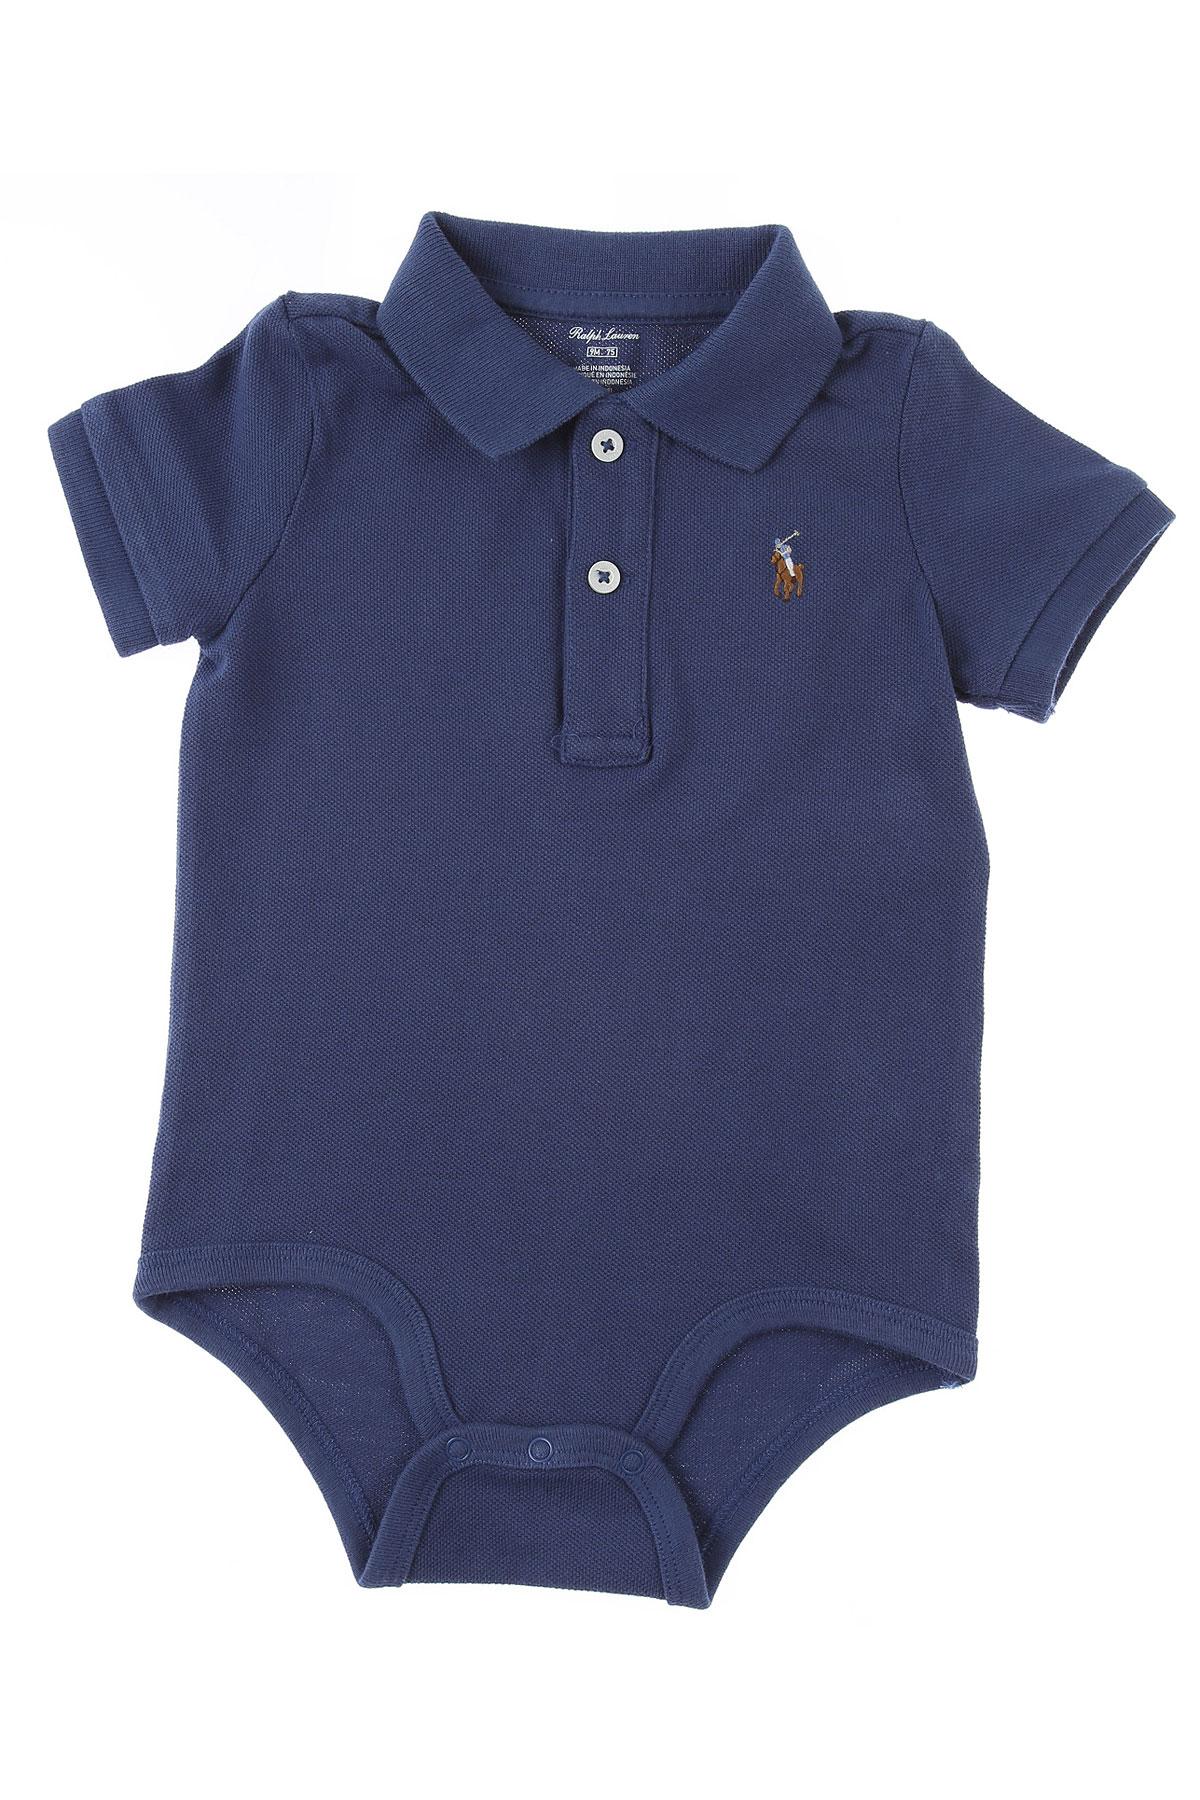 Ralph Lauren Baby Bodysuits & Onesies for Boys On Sale, Bue, Cotton, 2019, 12 M 9M